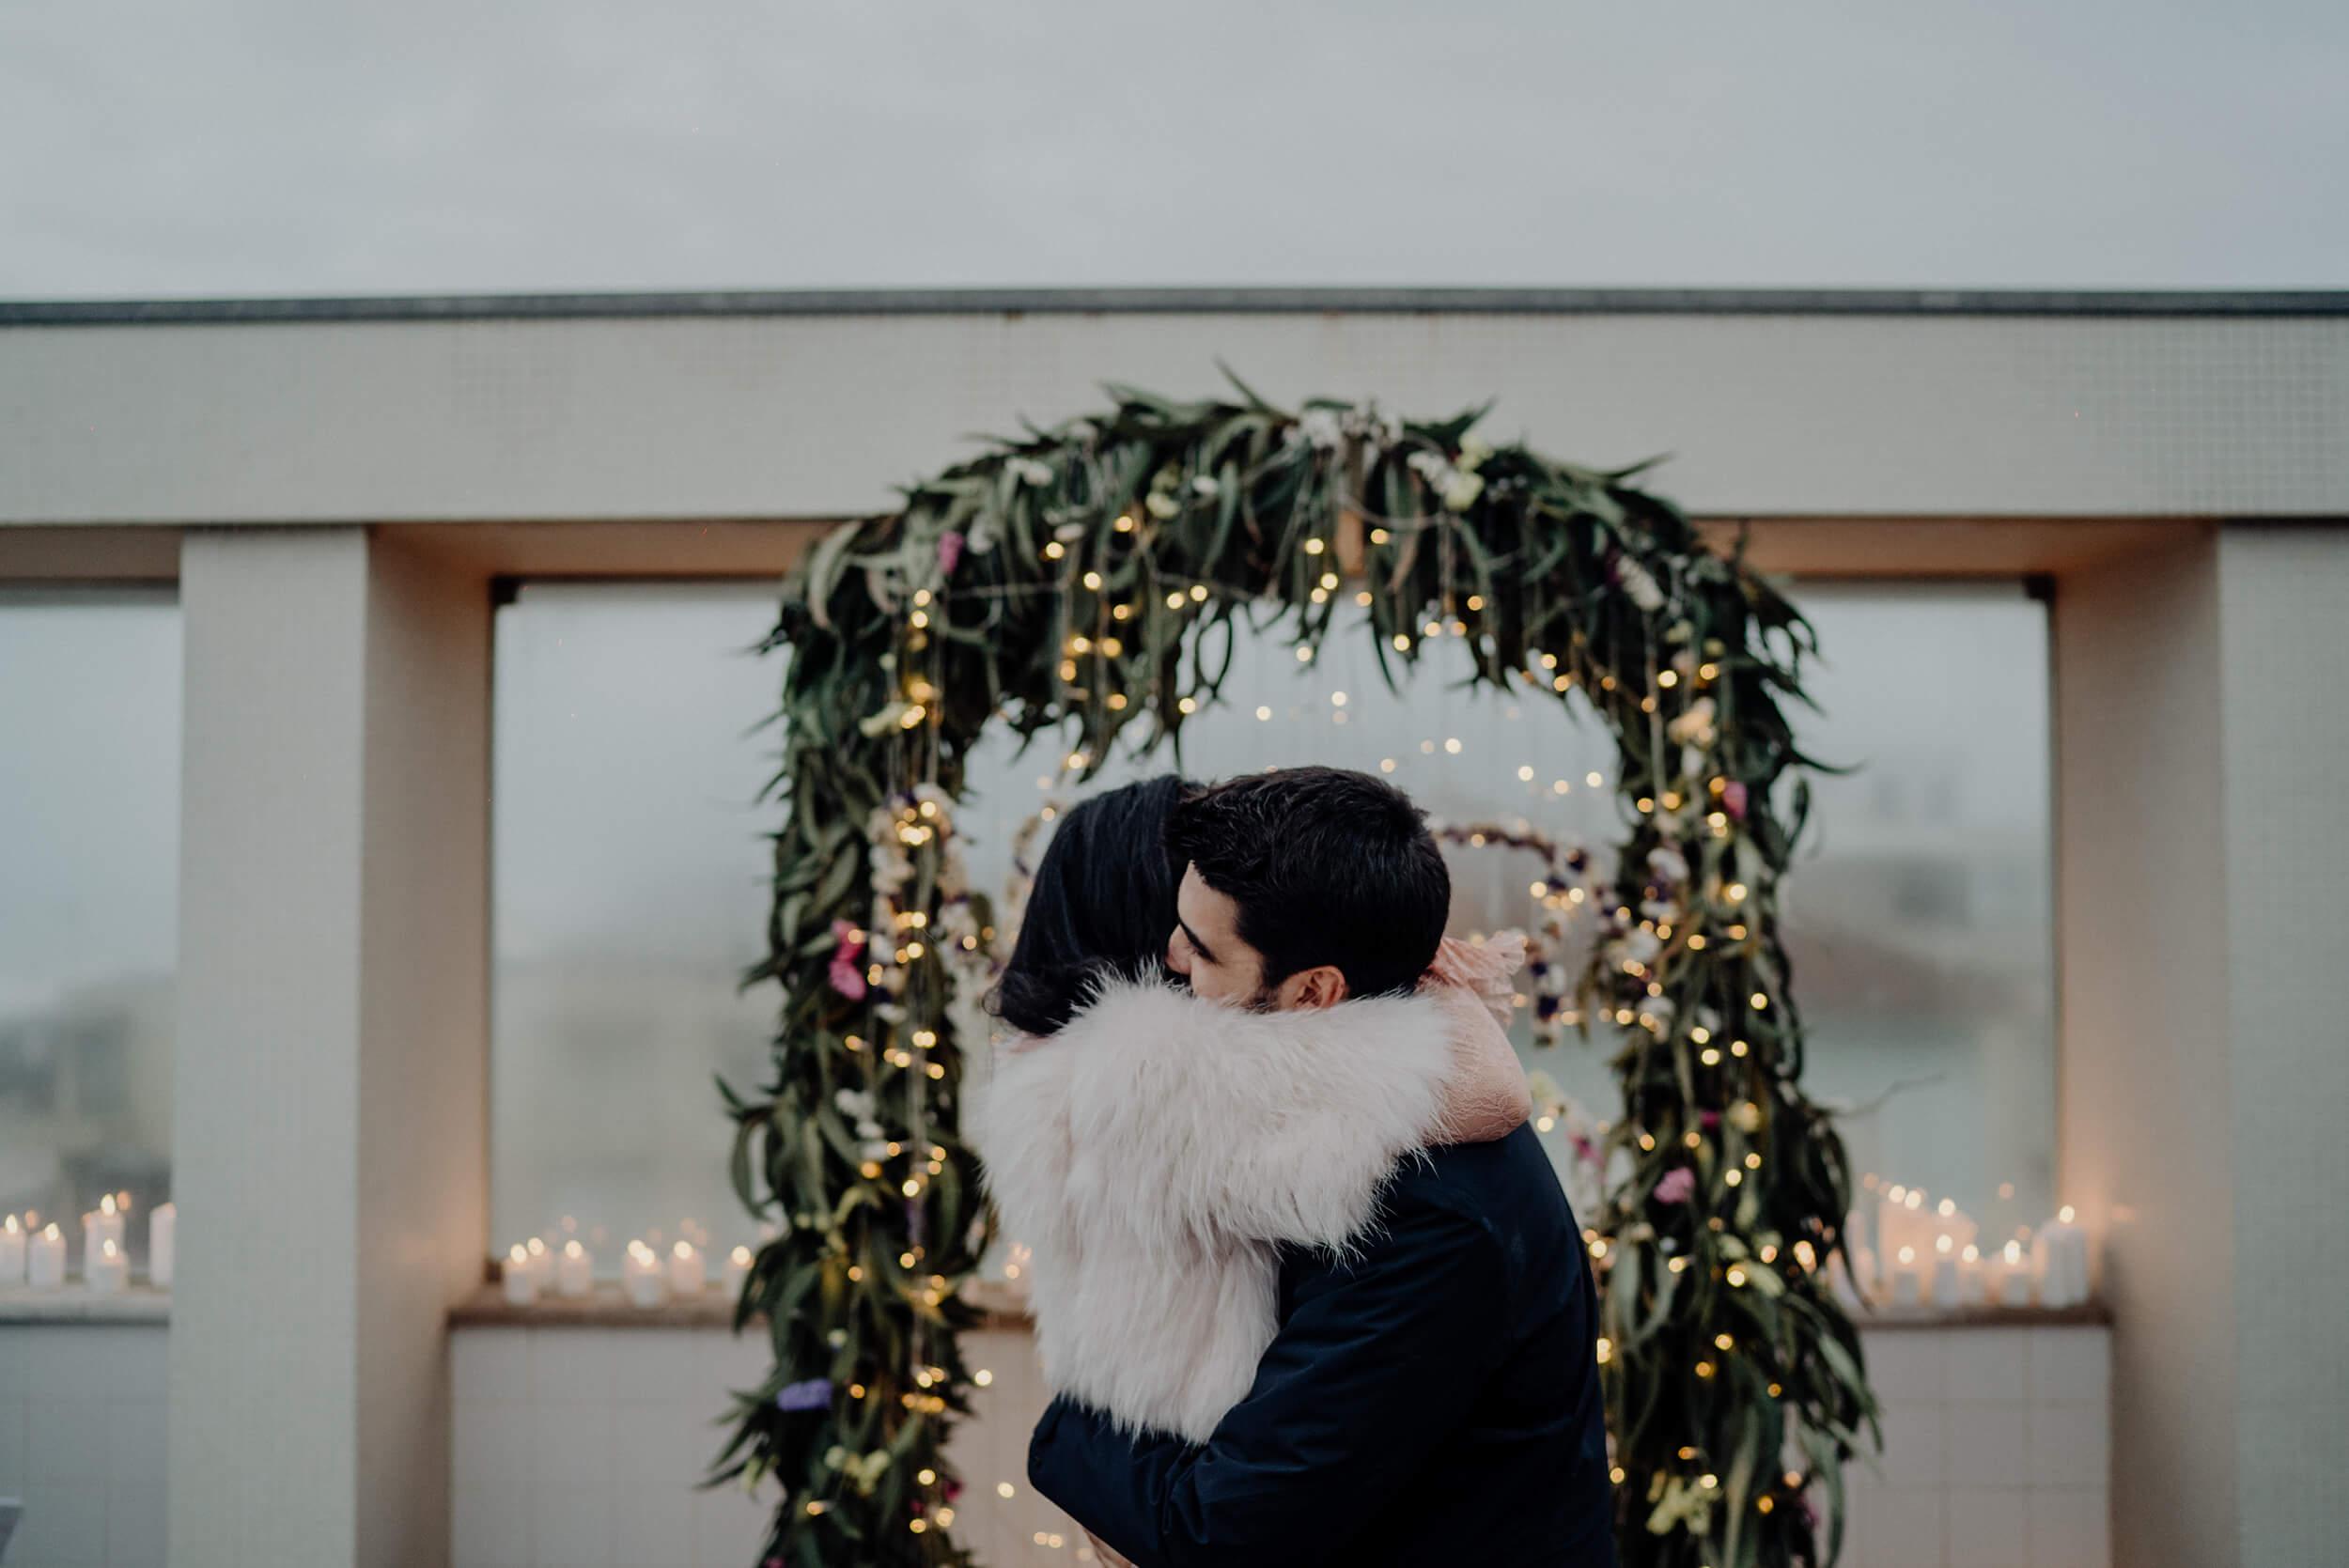 roma-organizacao-eventos-pedido-de-casamento-no-porto-26